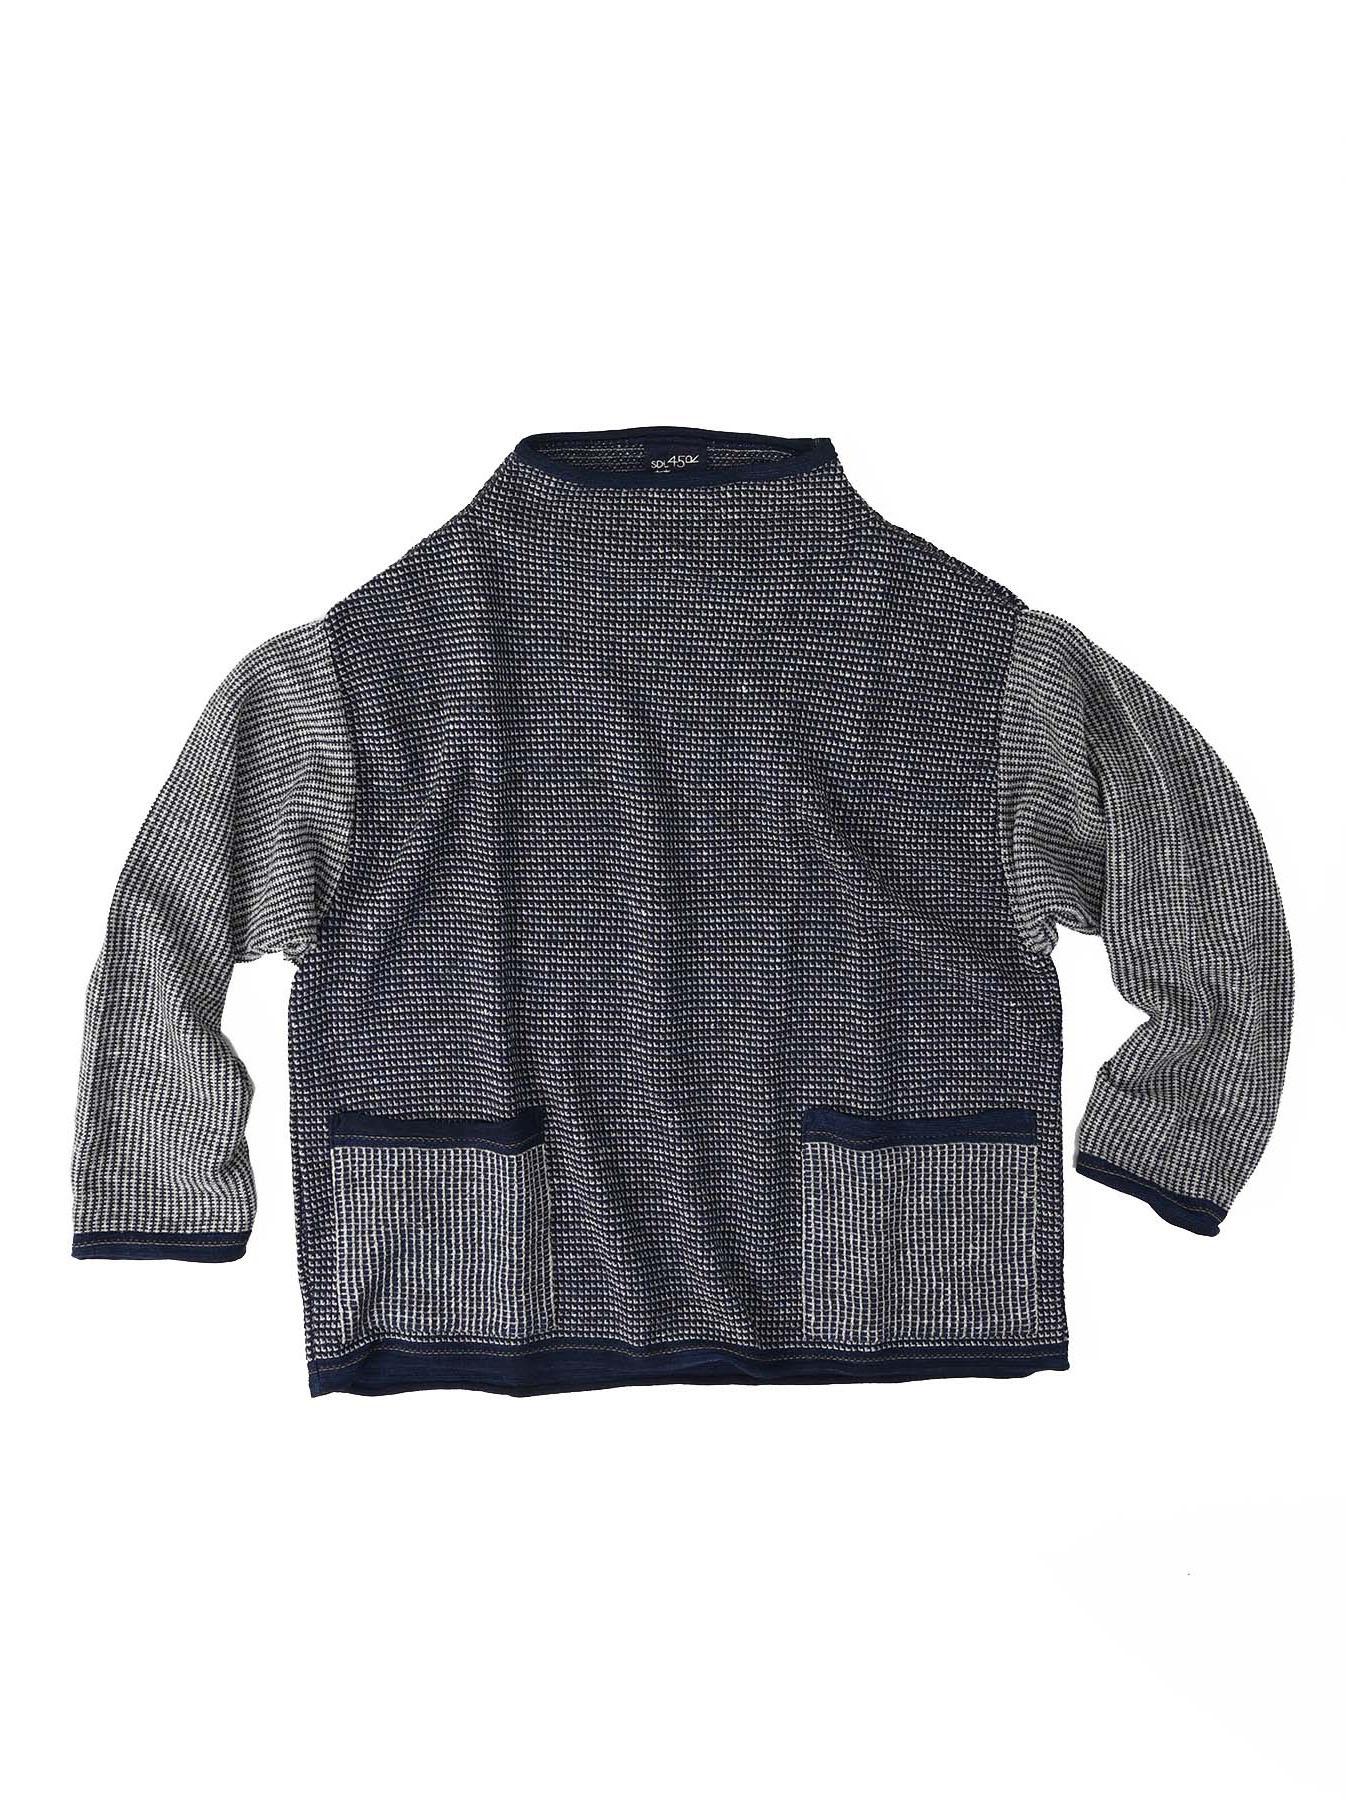 Indigo Tappet Kanoko Umahiko Sweater-1